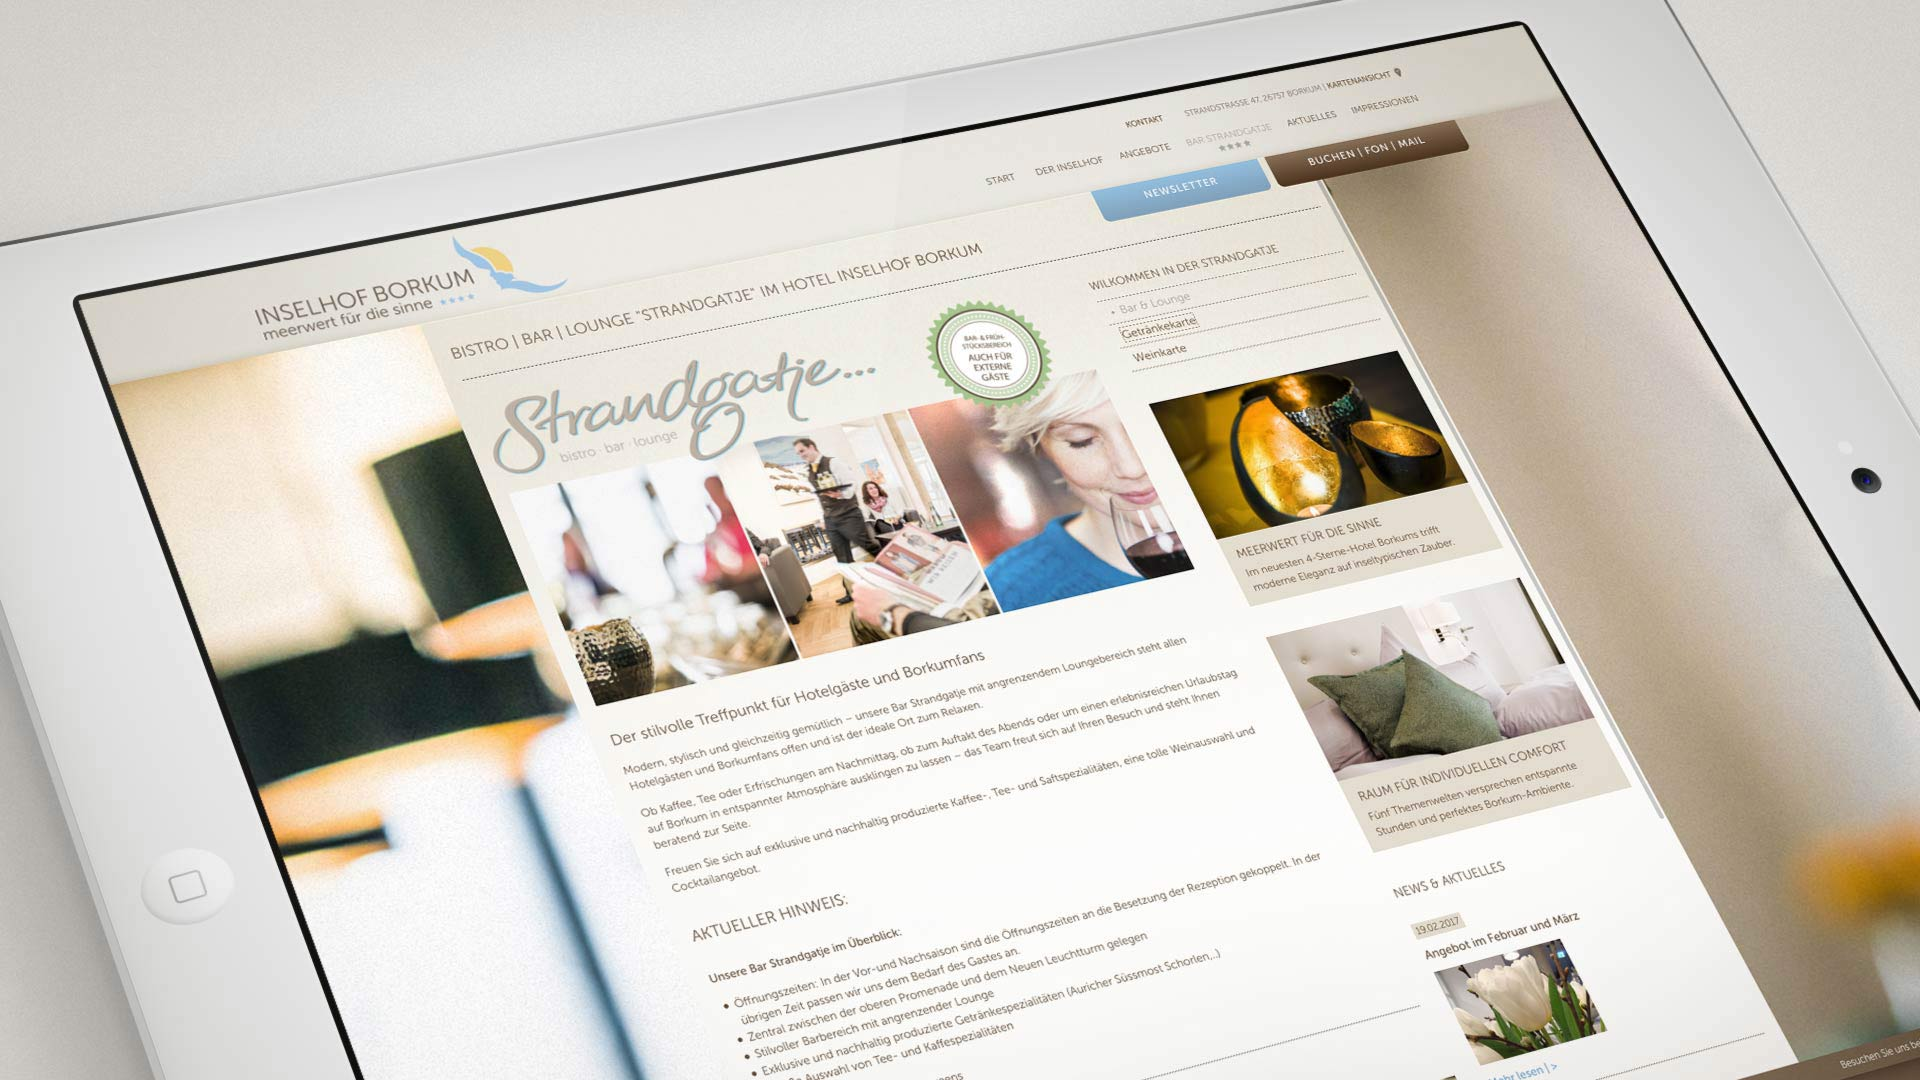 "artventura-Projekt Webentwicklung inselhof-borkum.de:Darstellung der Hotelbar ""Strandgatje"""